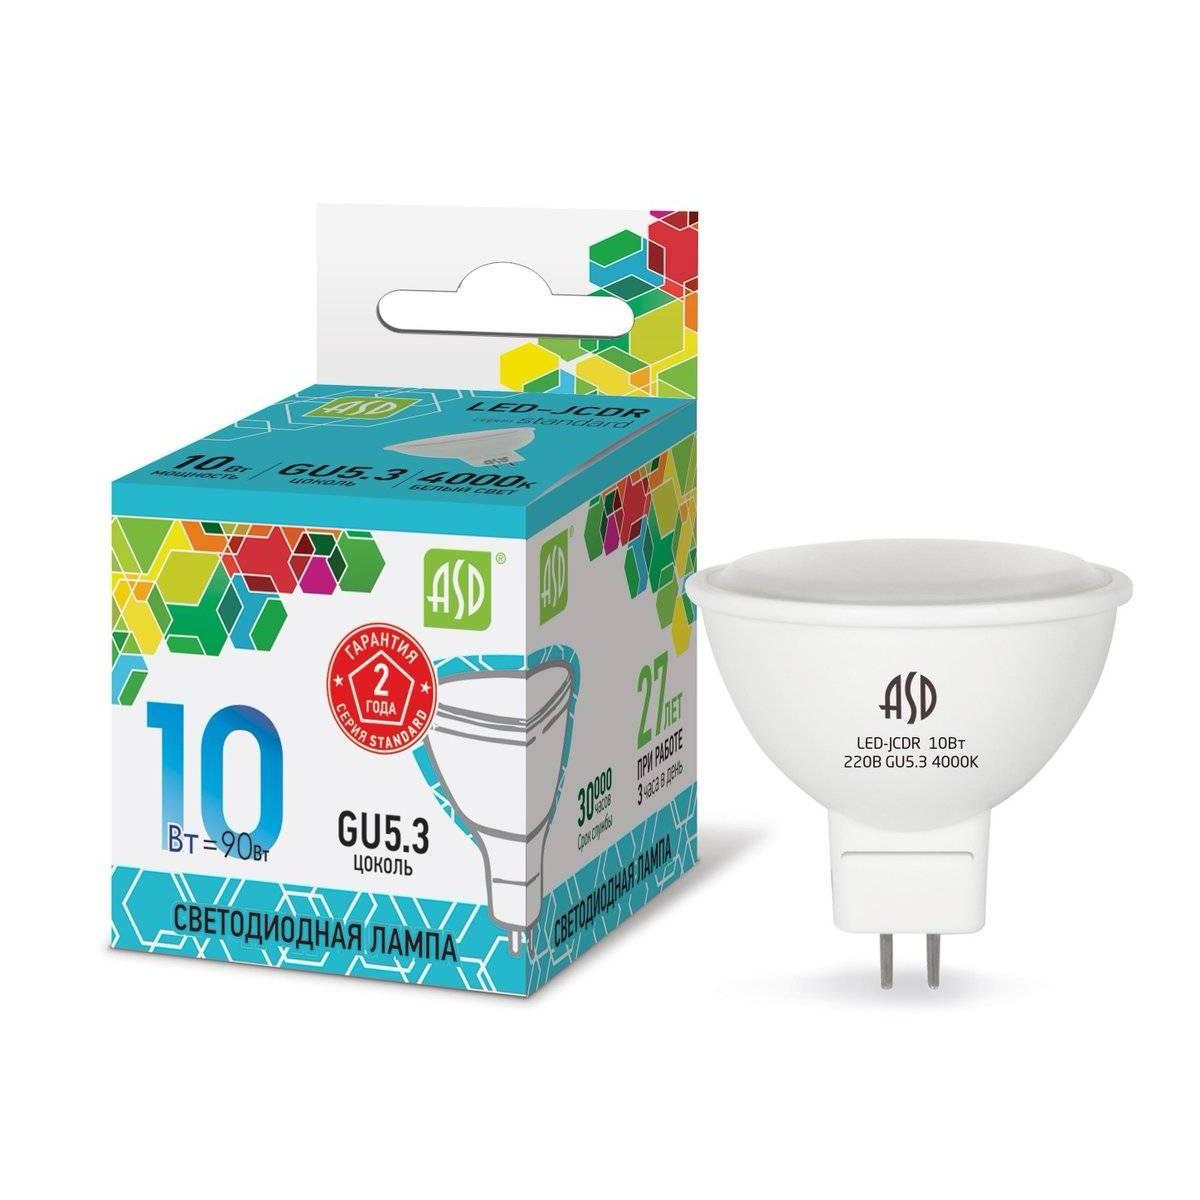 LED Bulb ASD MR16 GU5.3 220V 10W 4000 K 4K 50x55 Plastic/alum Standard 5828